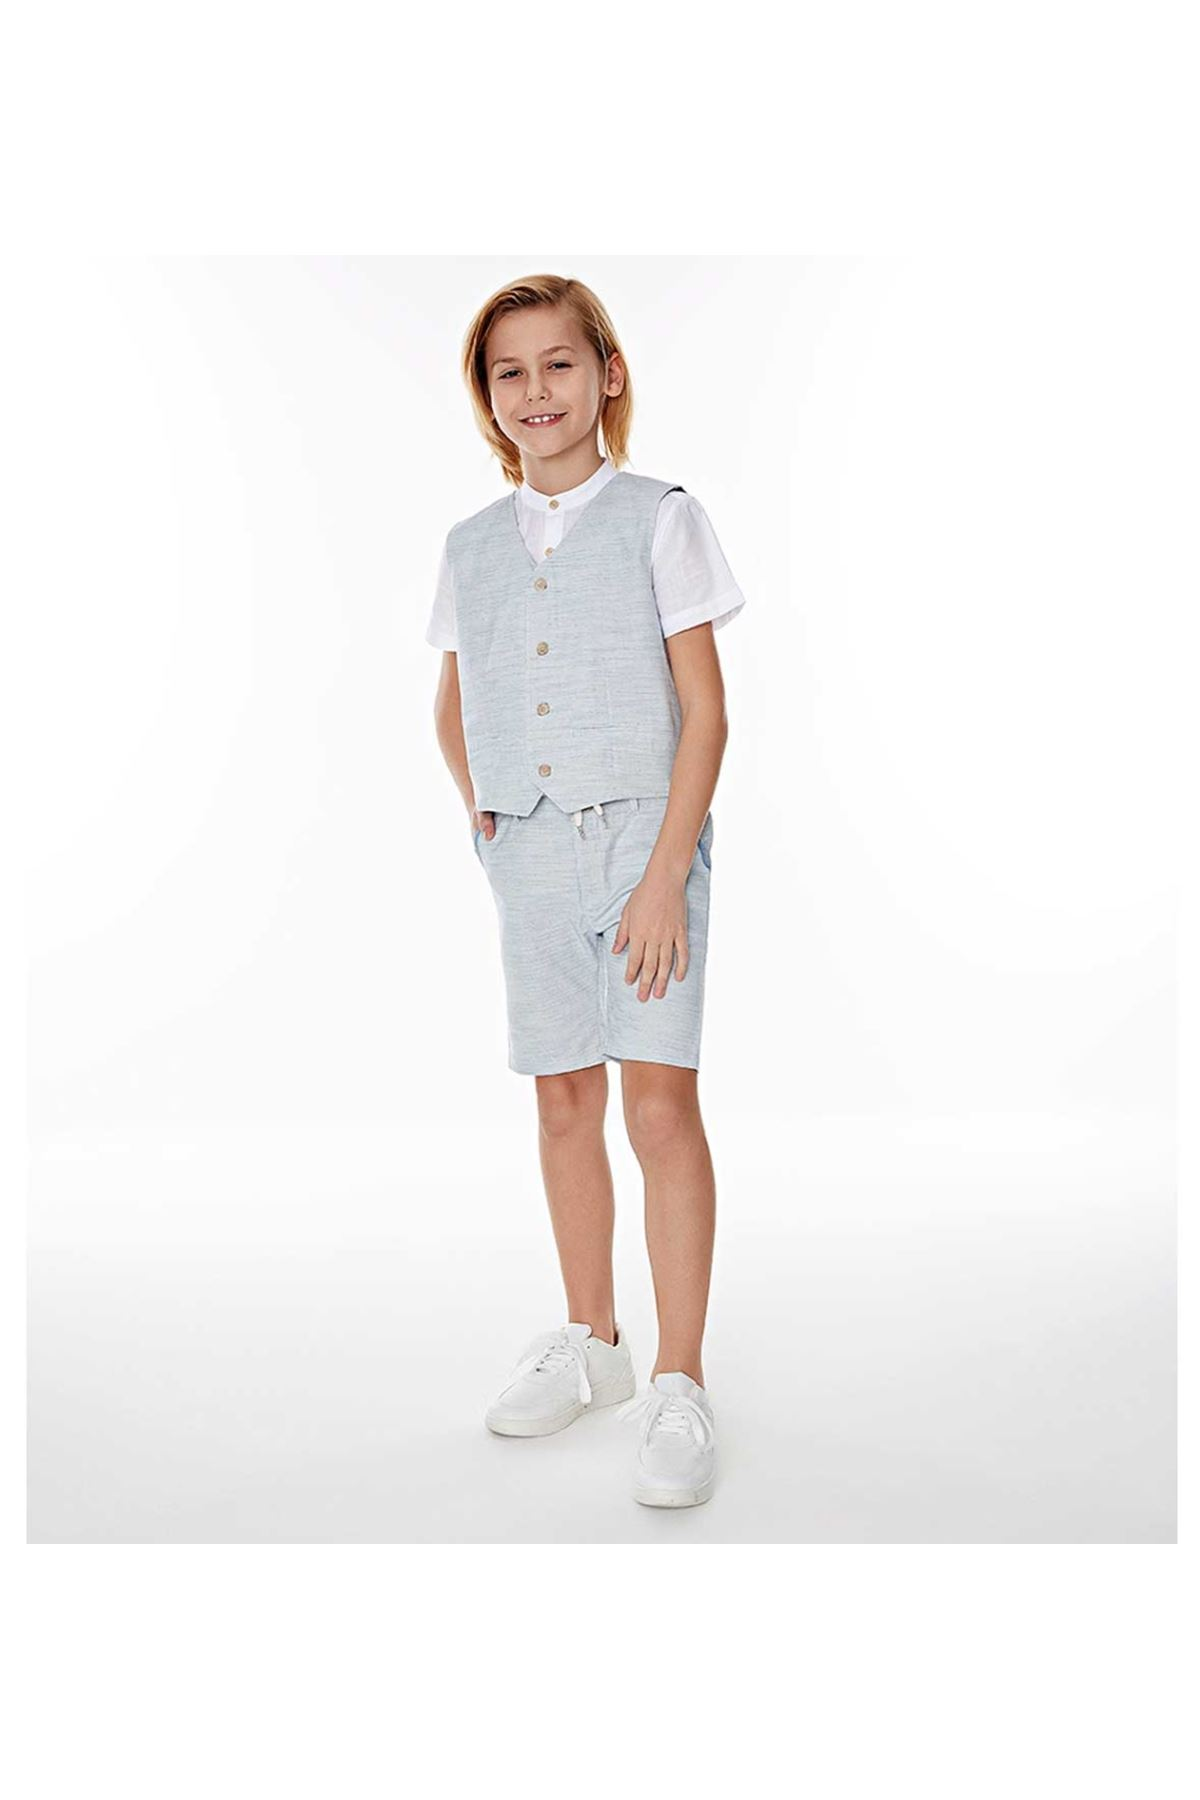 Wonder Kids Male Child Shorts 010-6246-011